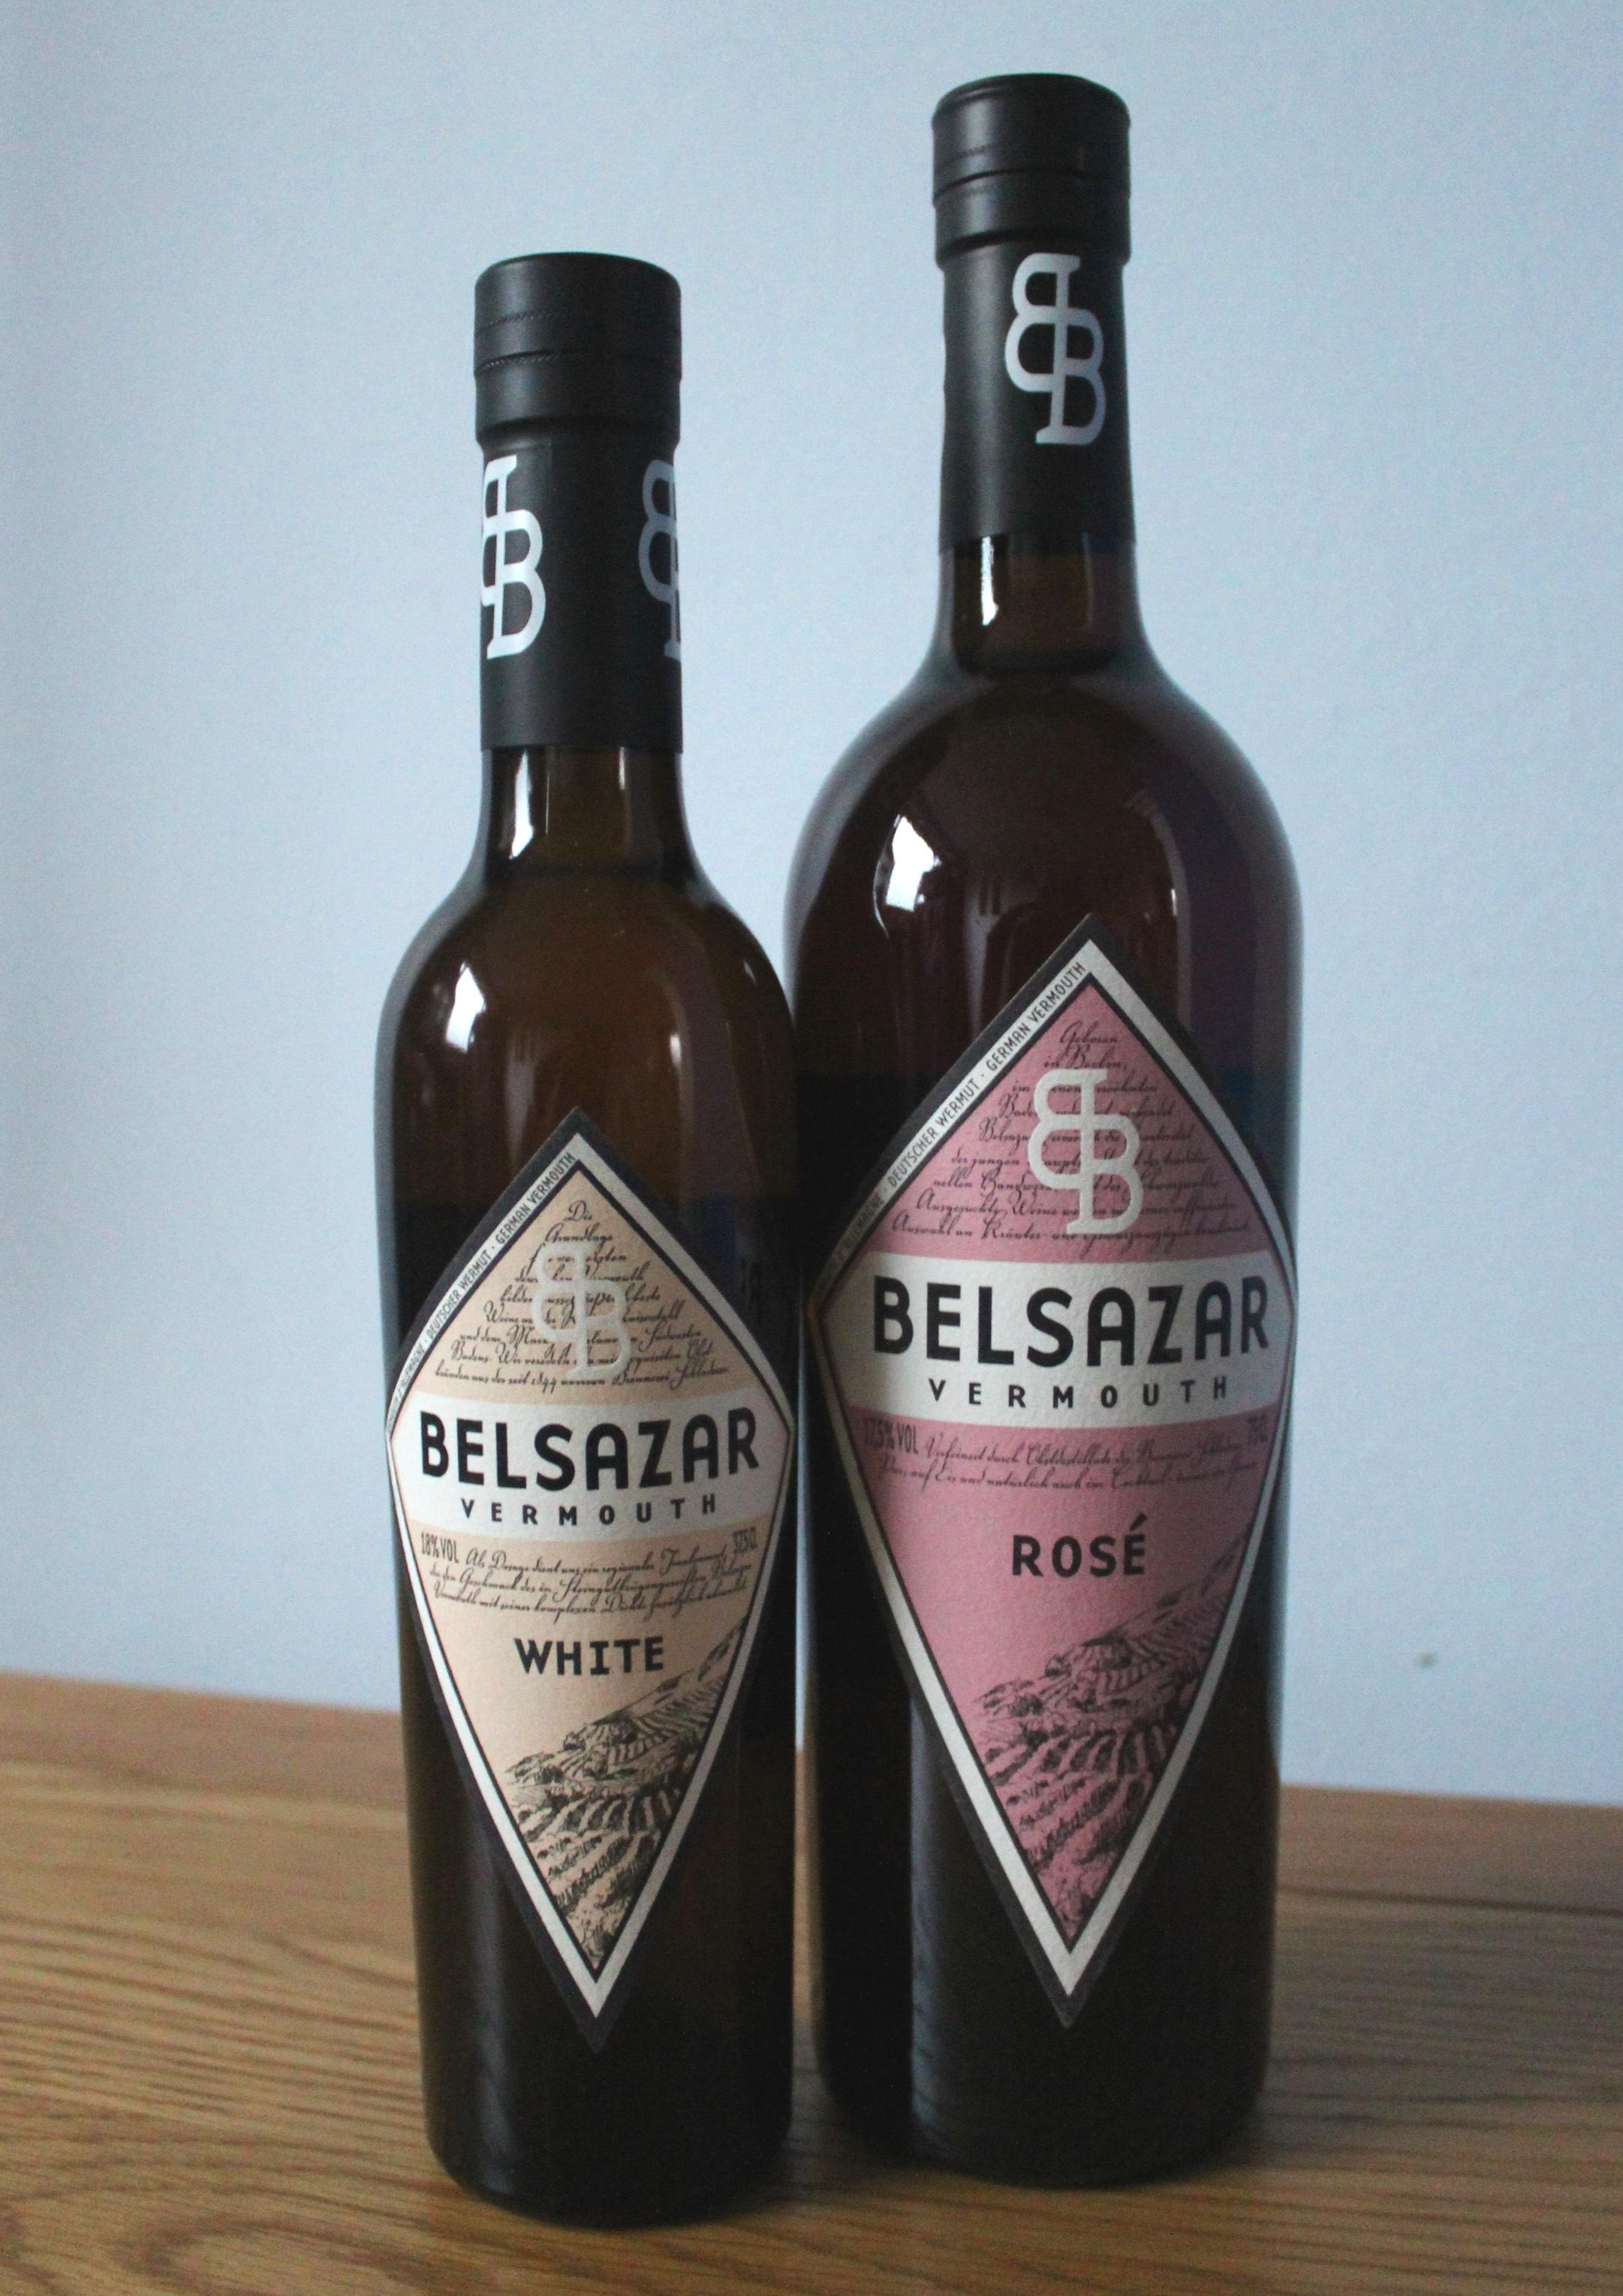 Belsazar Vermouth low alcohol